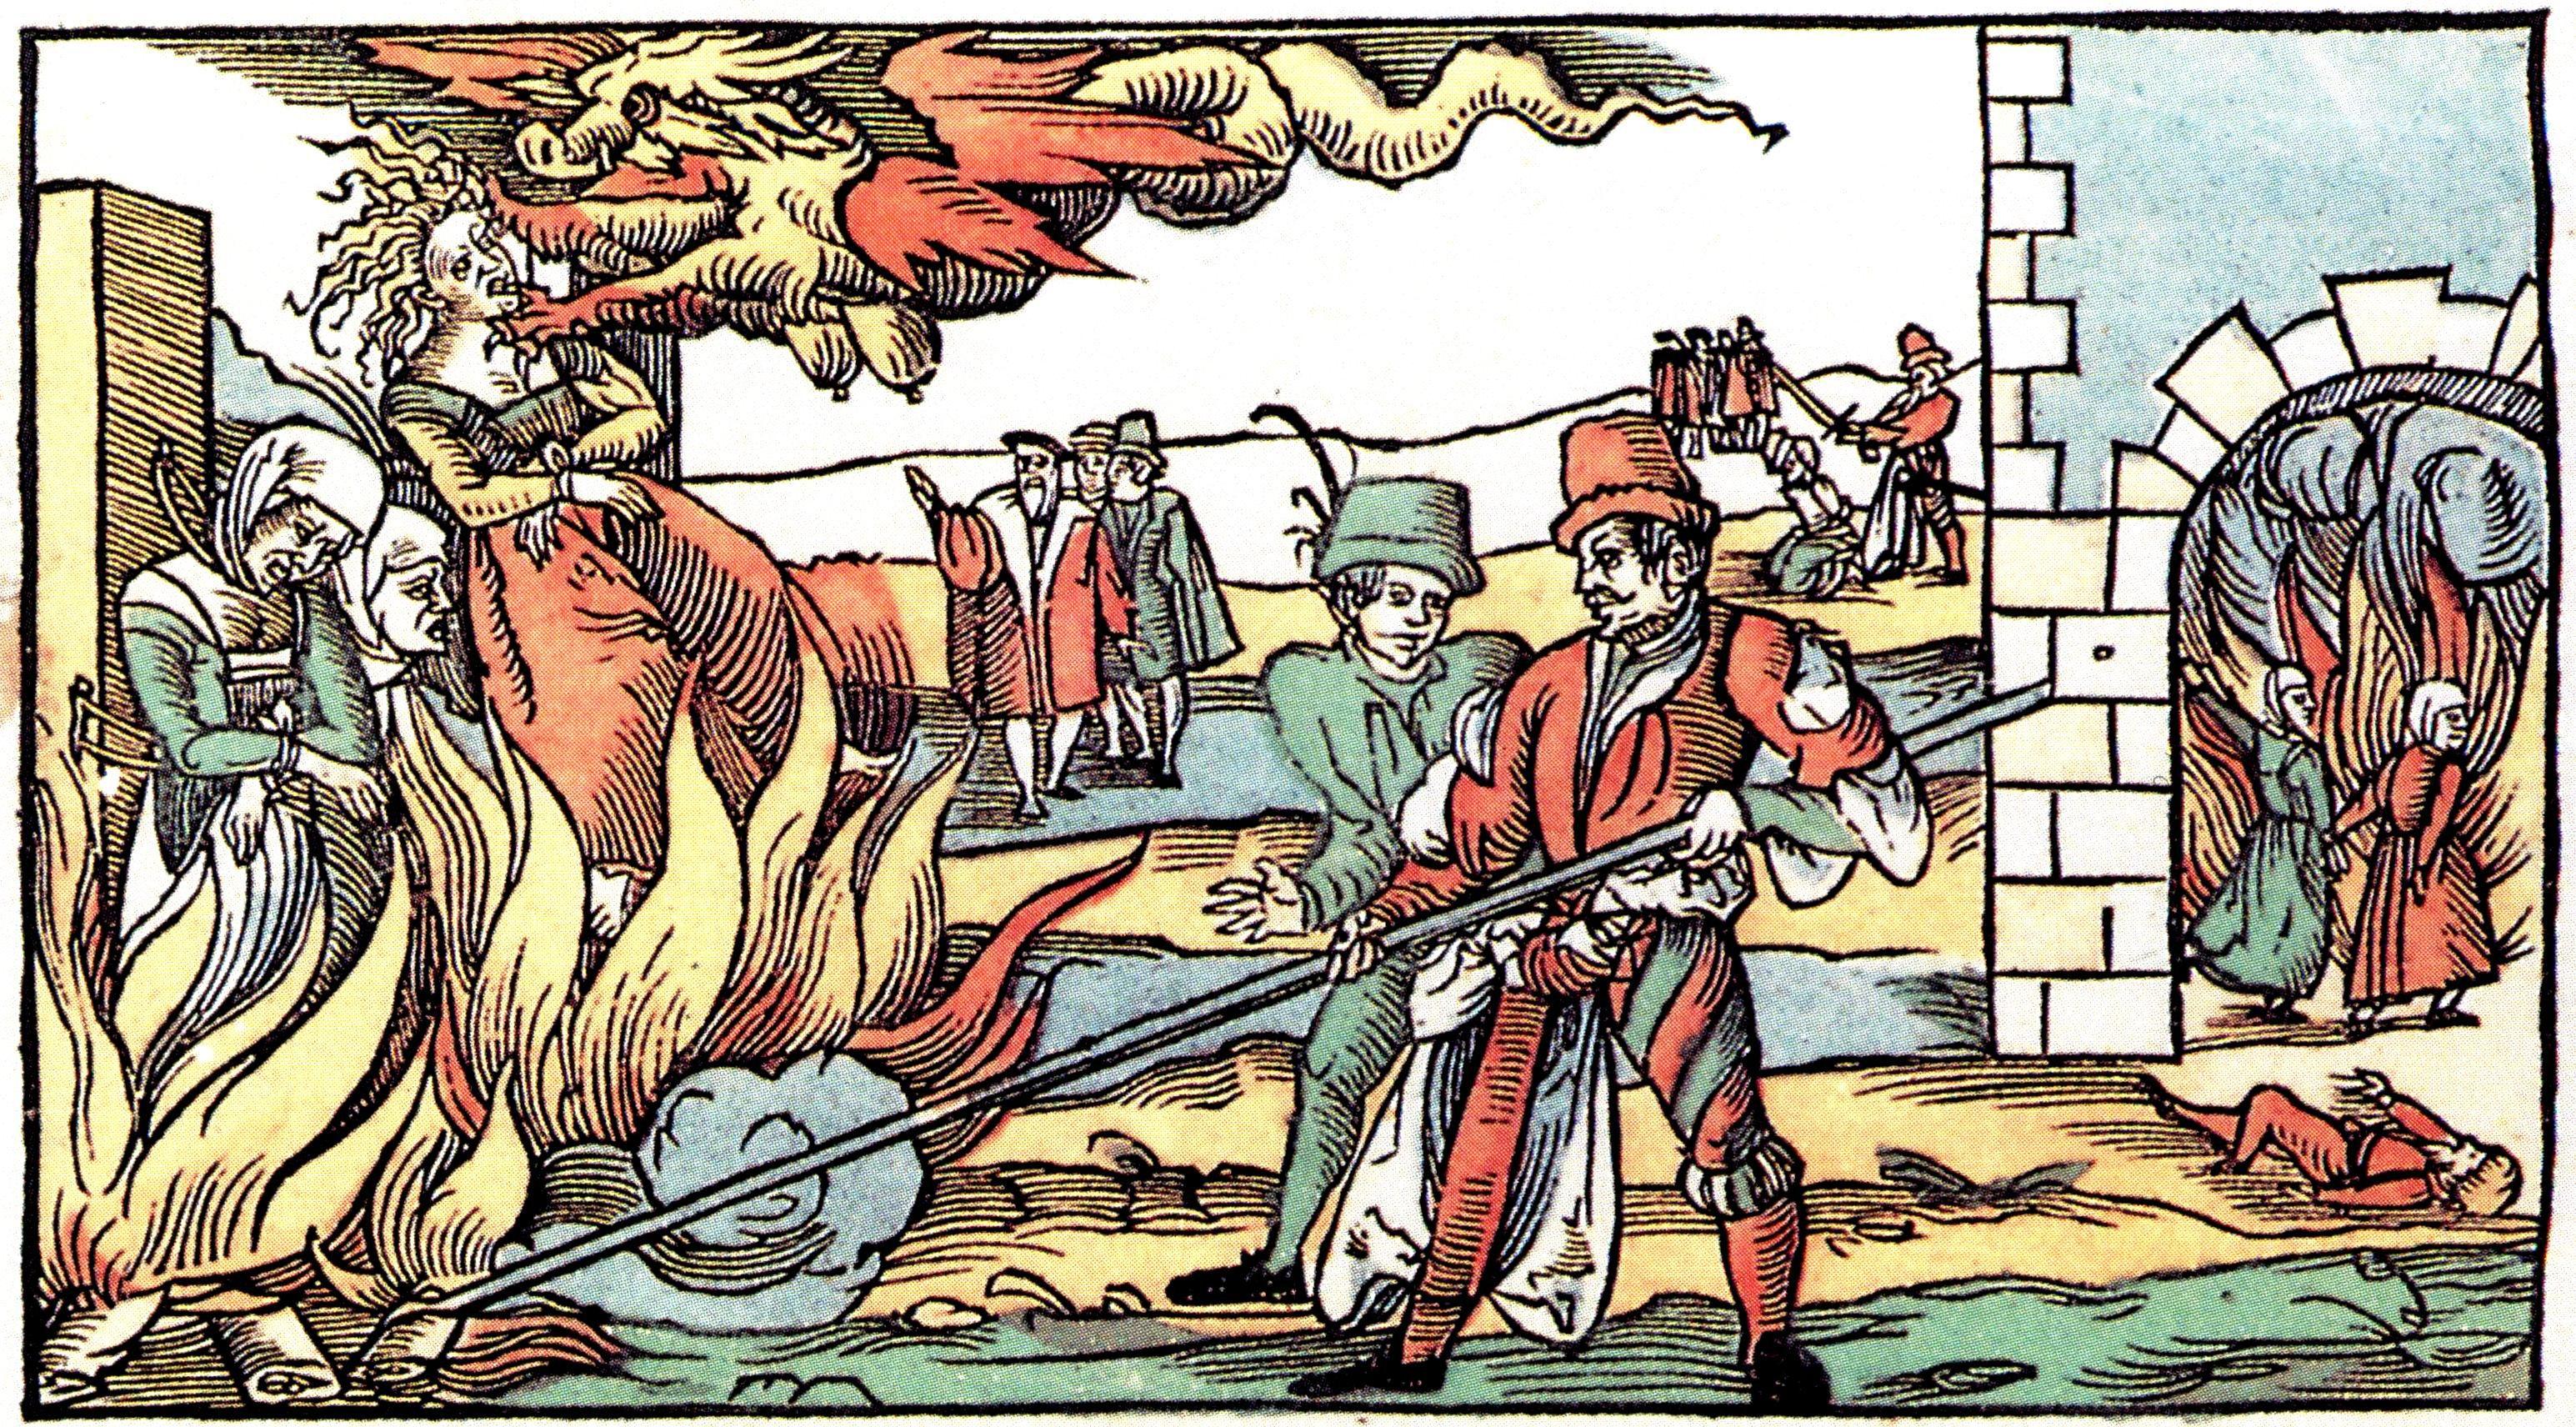 vortrag-hegeler-02-12-11-hexenverbrennung-flugblatt-derneburg-farbe1.jpg